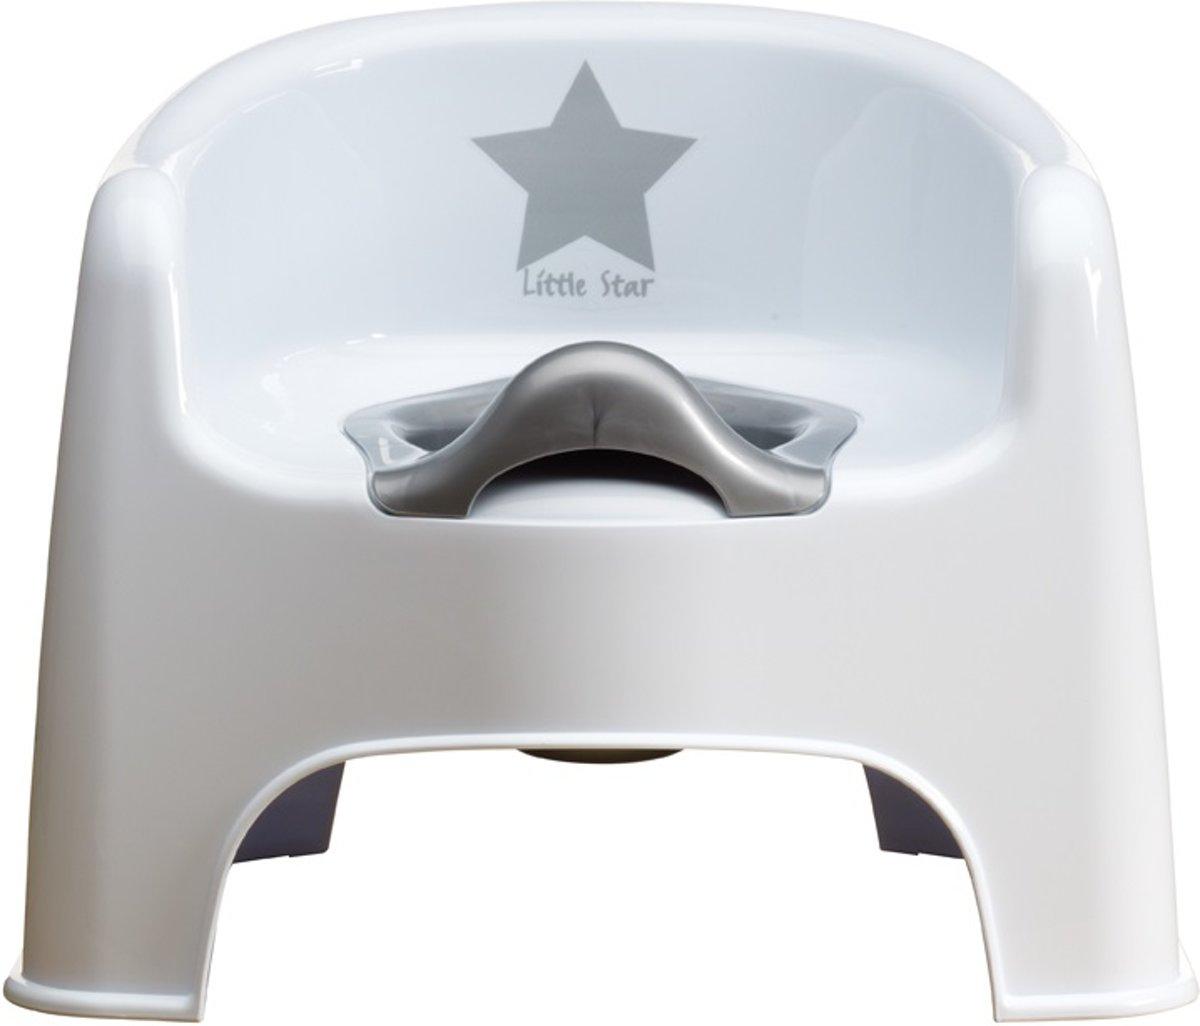 Strata Potje little star- potty Chair - oefenpotje - zindelijksheidstraining kopen